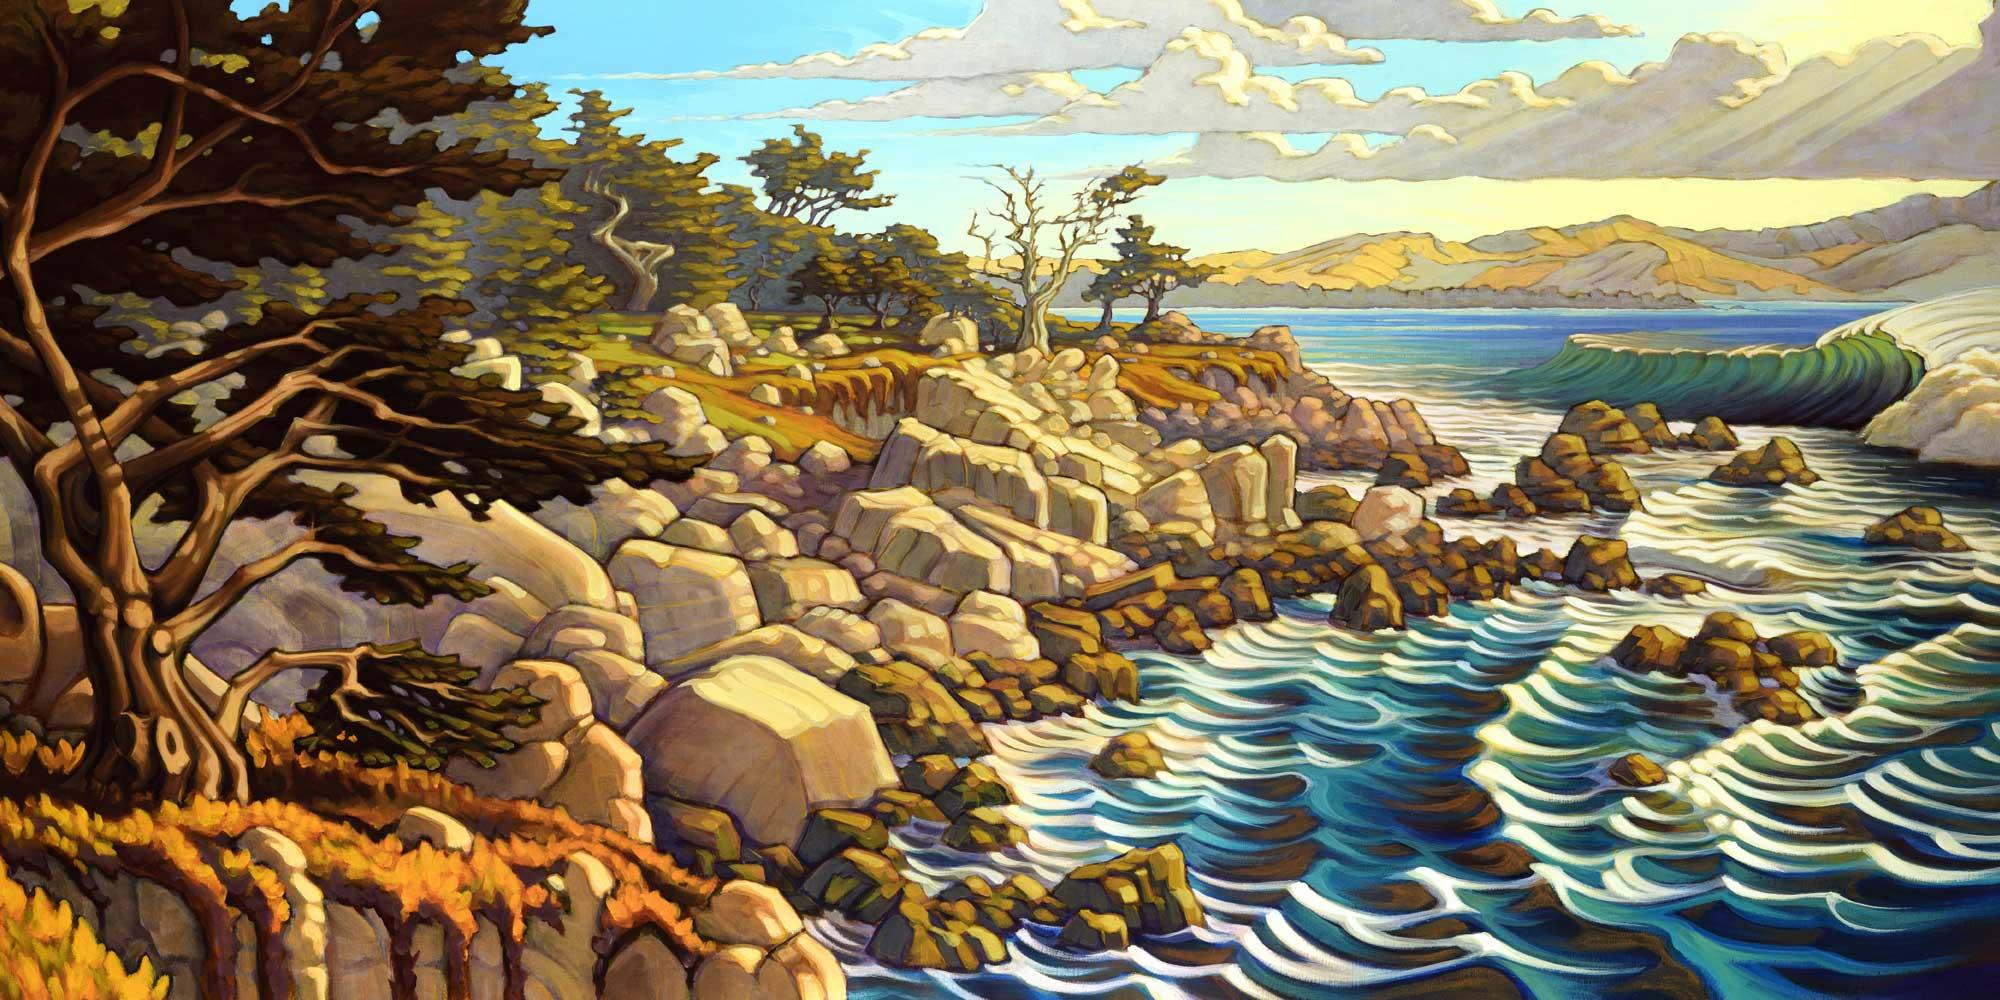 Painting by Matt Beard of the coast of California